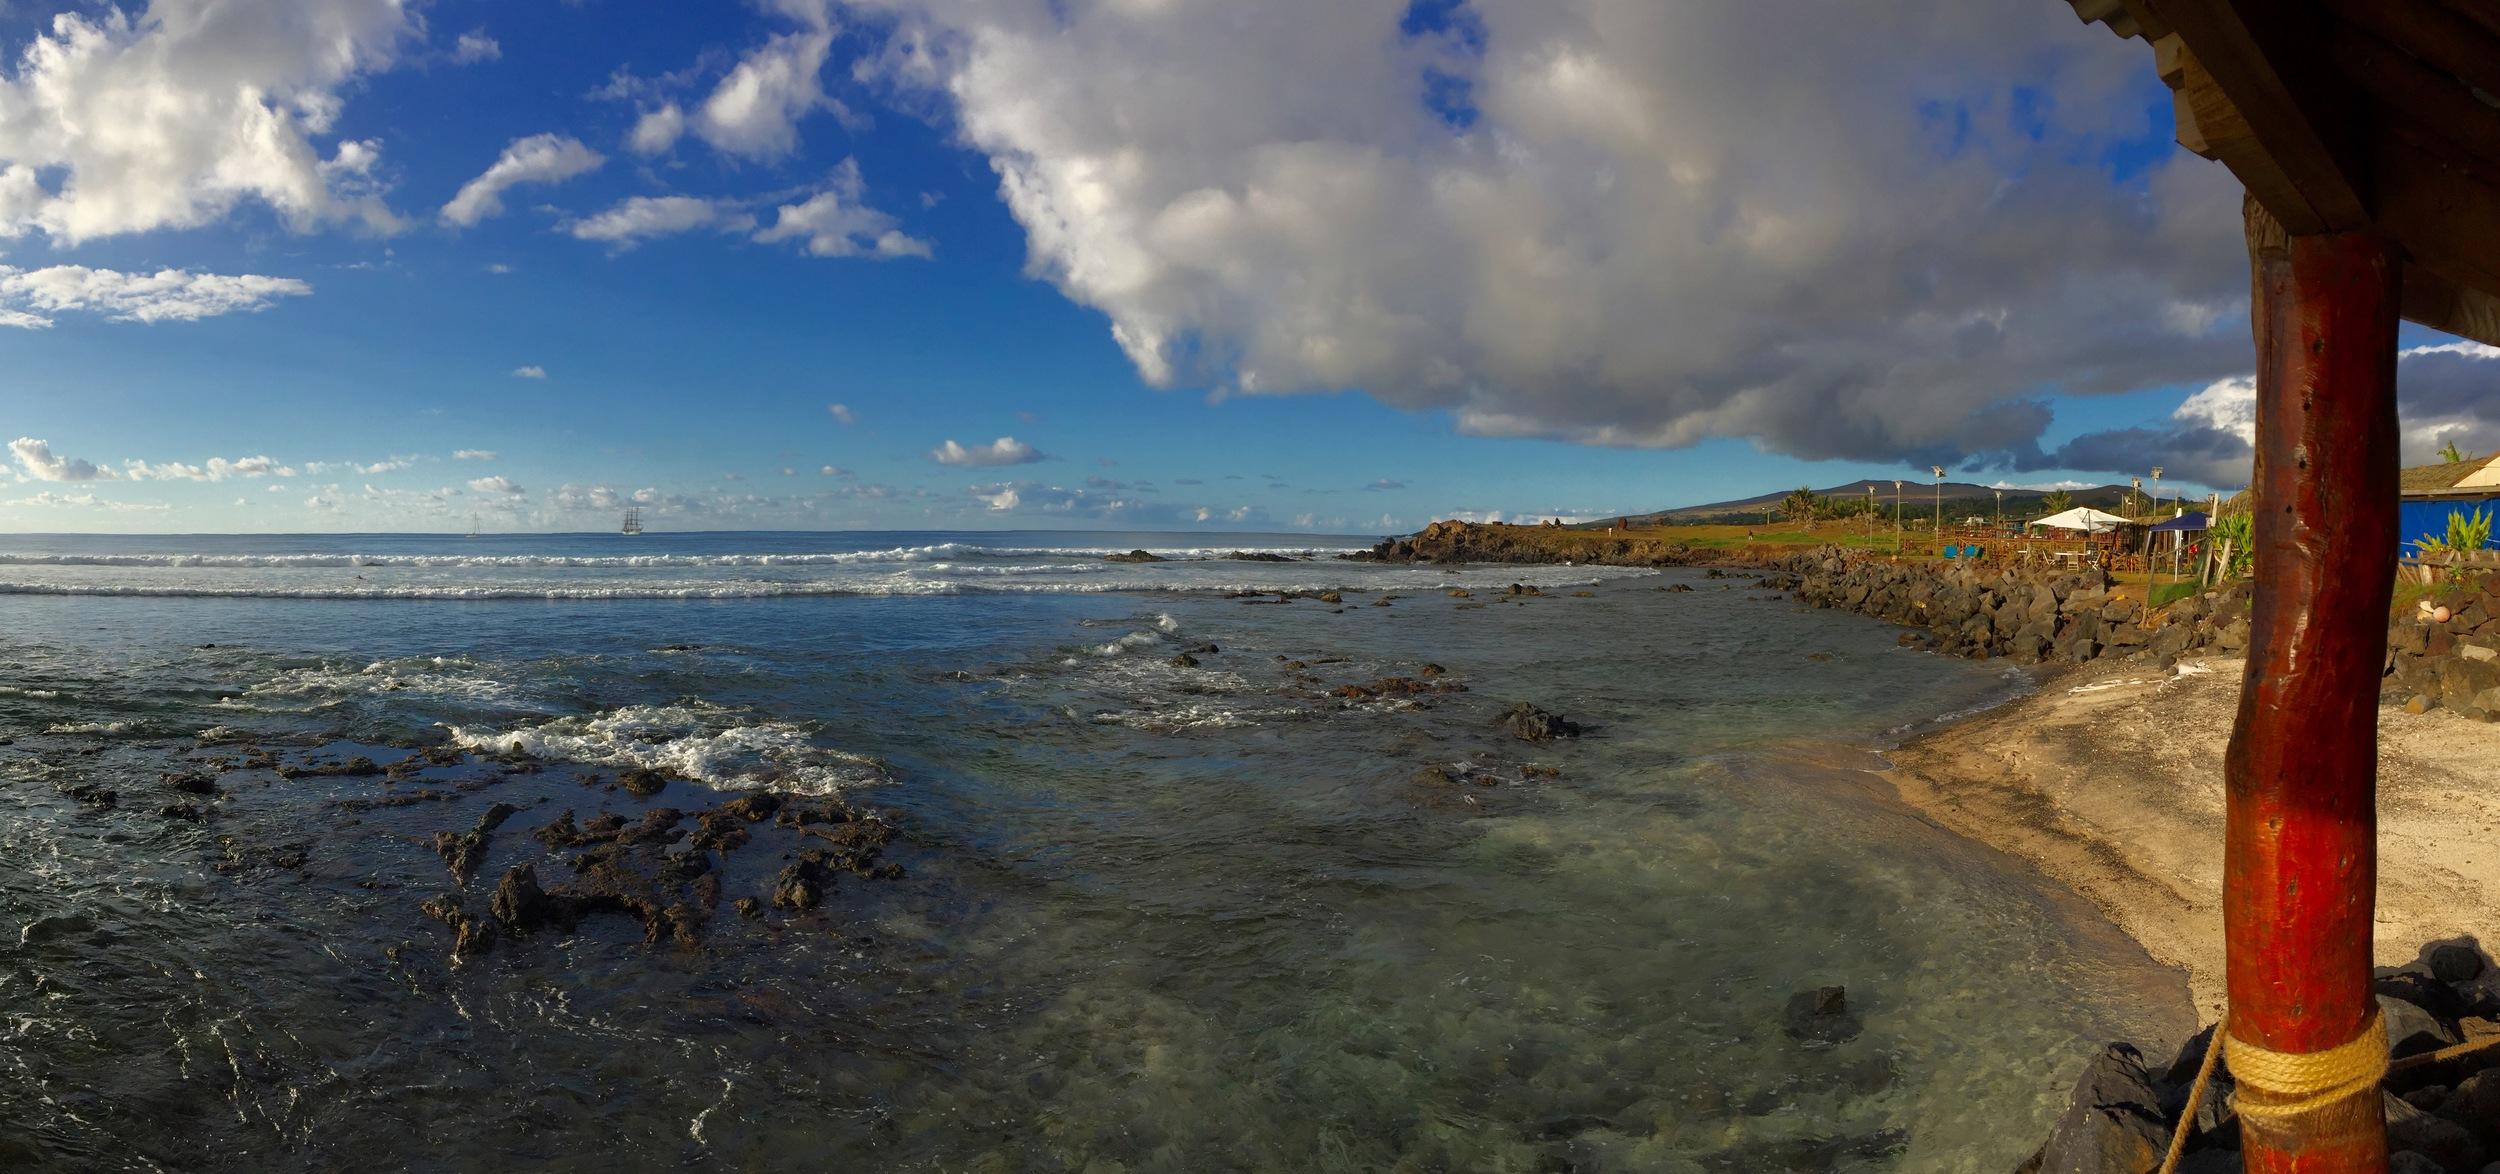 The coastline of Rapa Nui, or Easter Island, at Hanga Roa, the island's main town. The nearest populated island is PItcairn, 1,289 miles away.